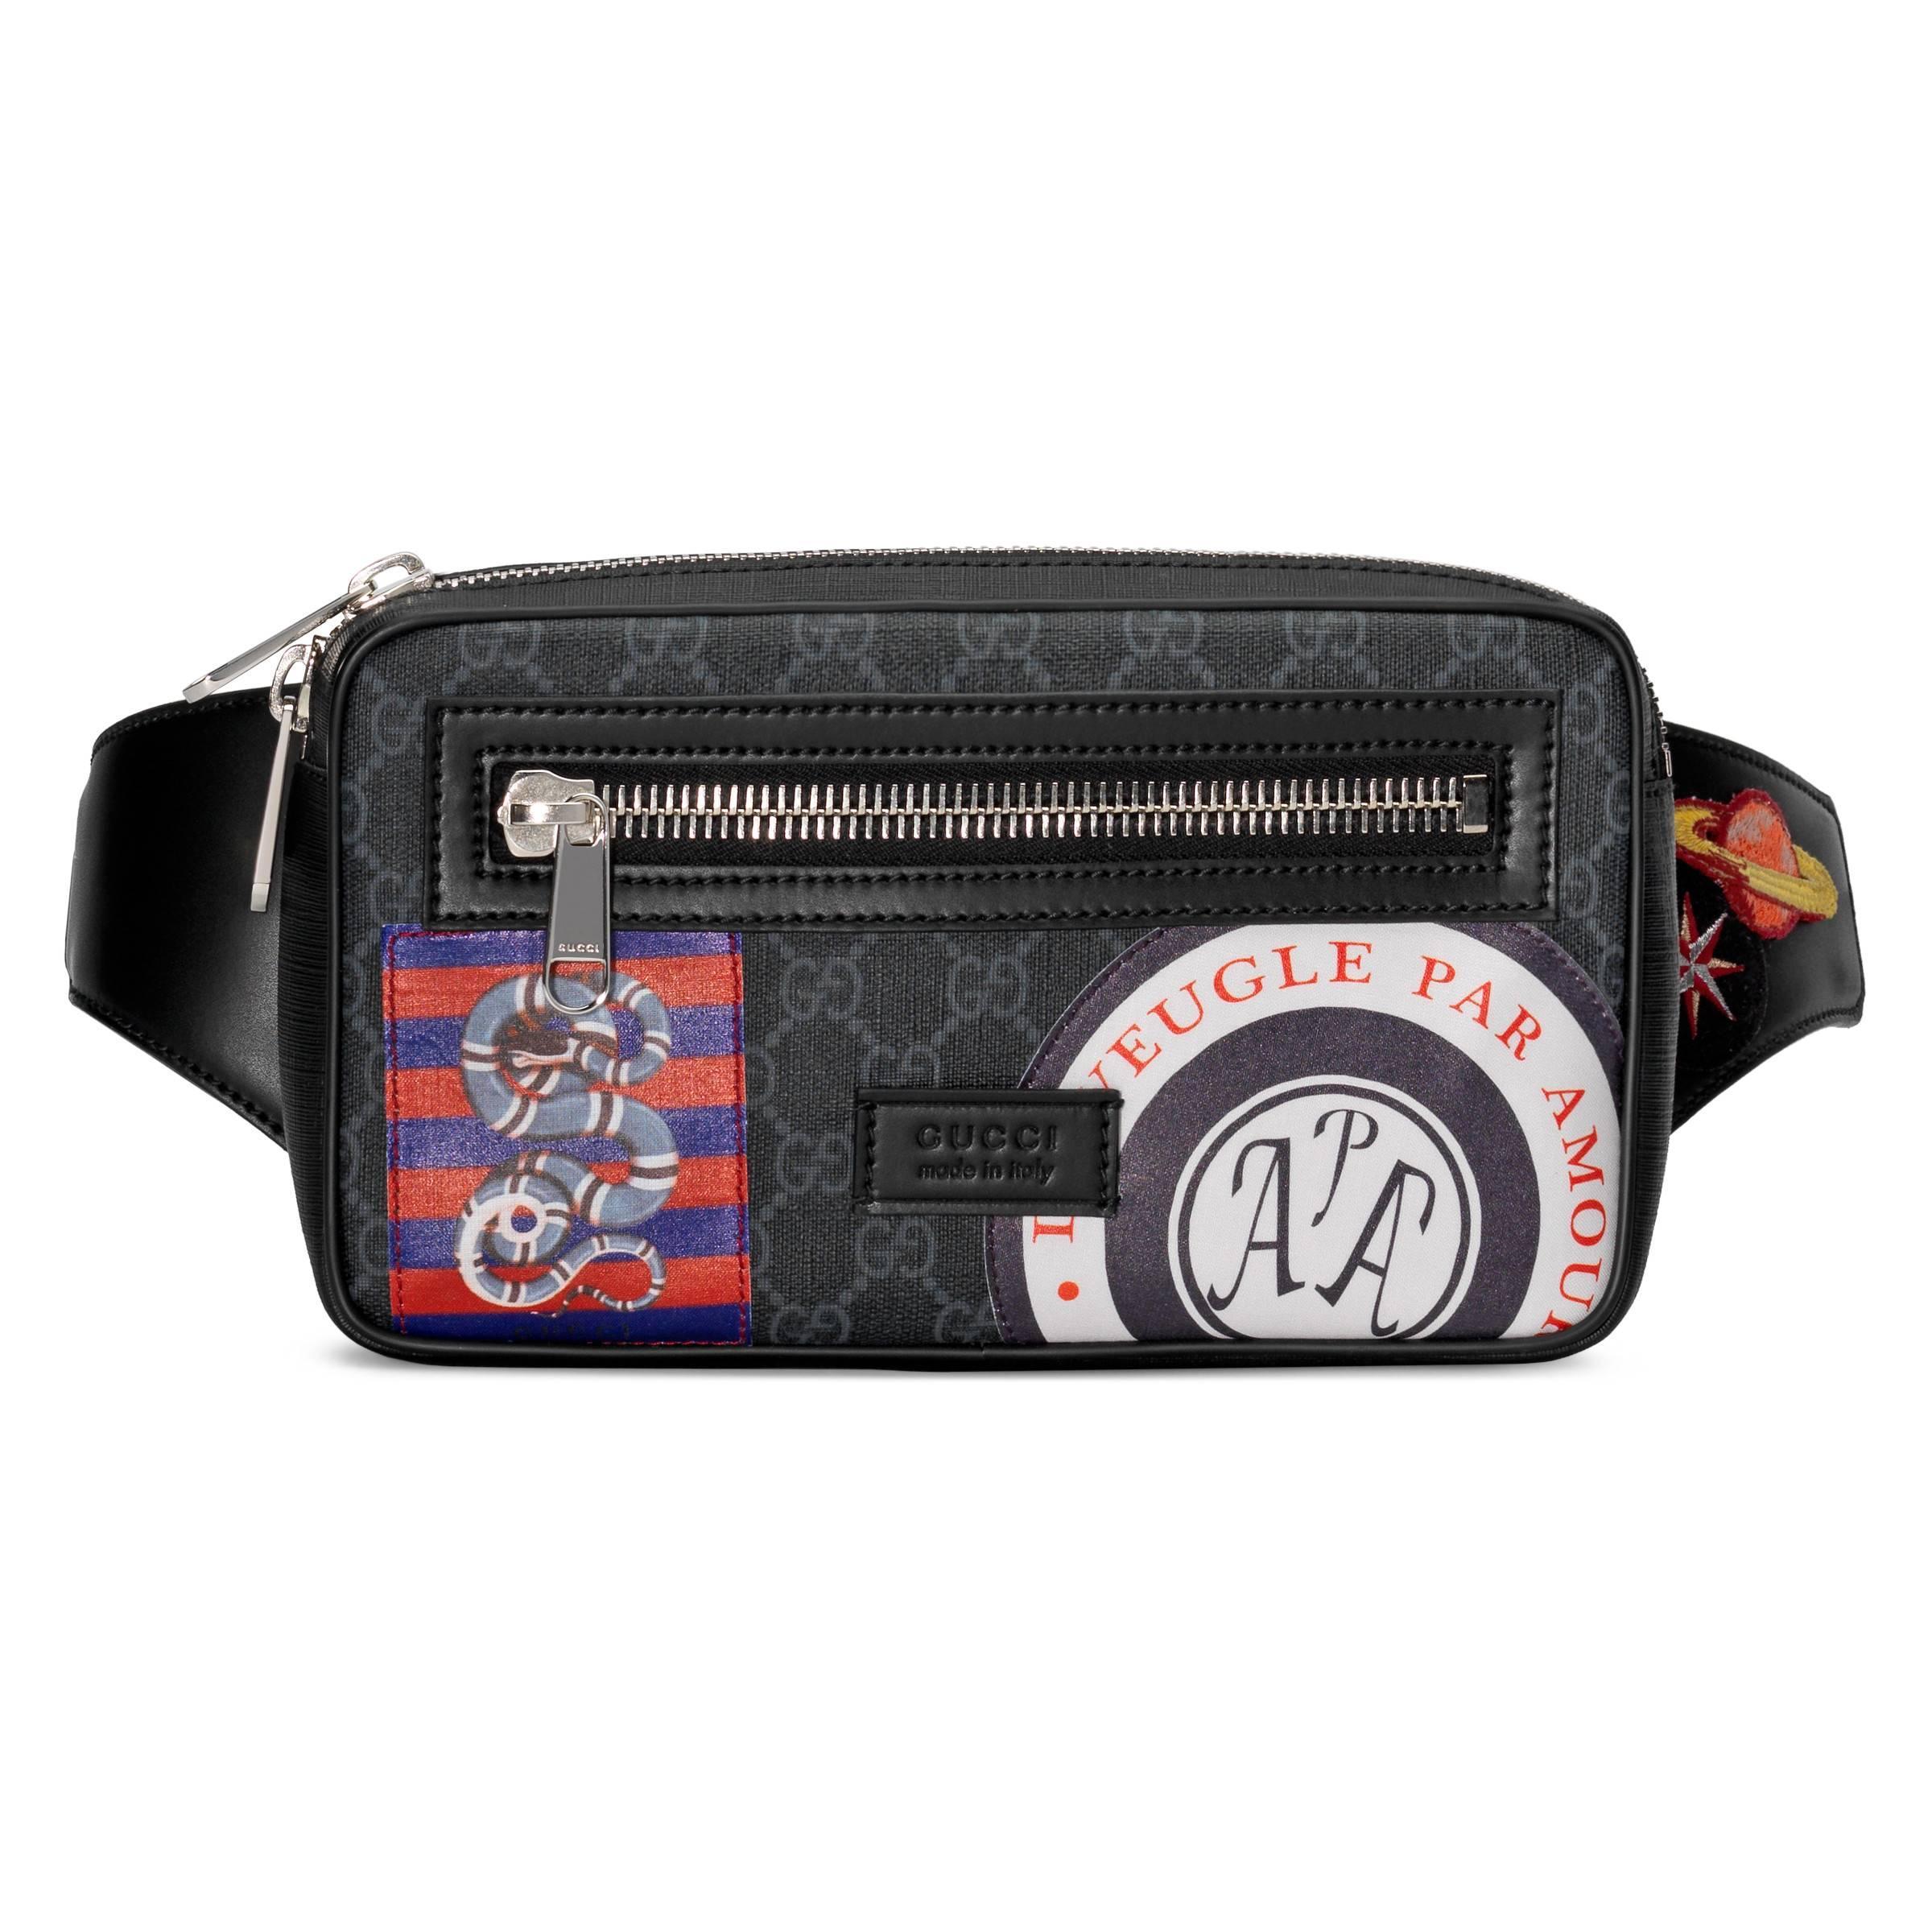 3fec04c74 Gucci - Black Bolsa con Cinturón Night Courrier GG Supreme Suave for Men -  Lyst. Ver en pantalla completa